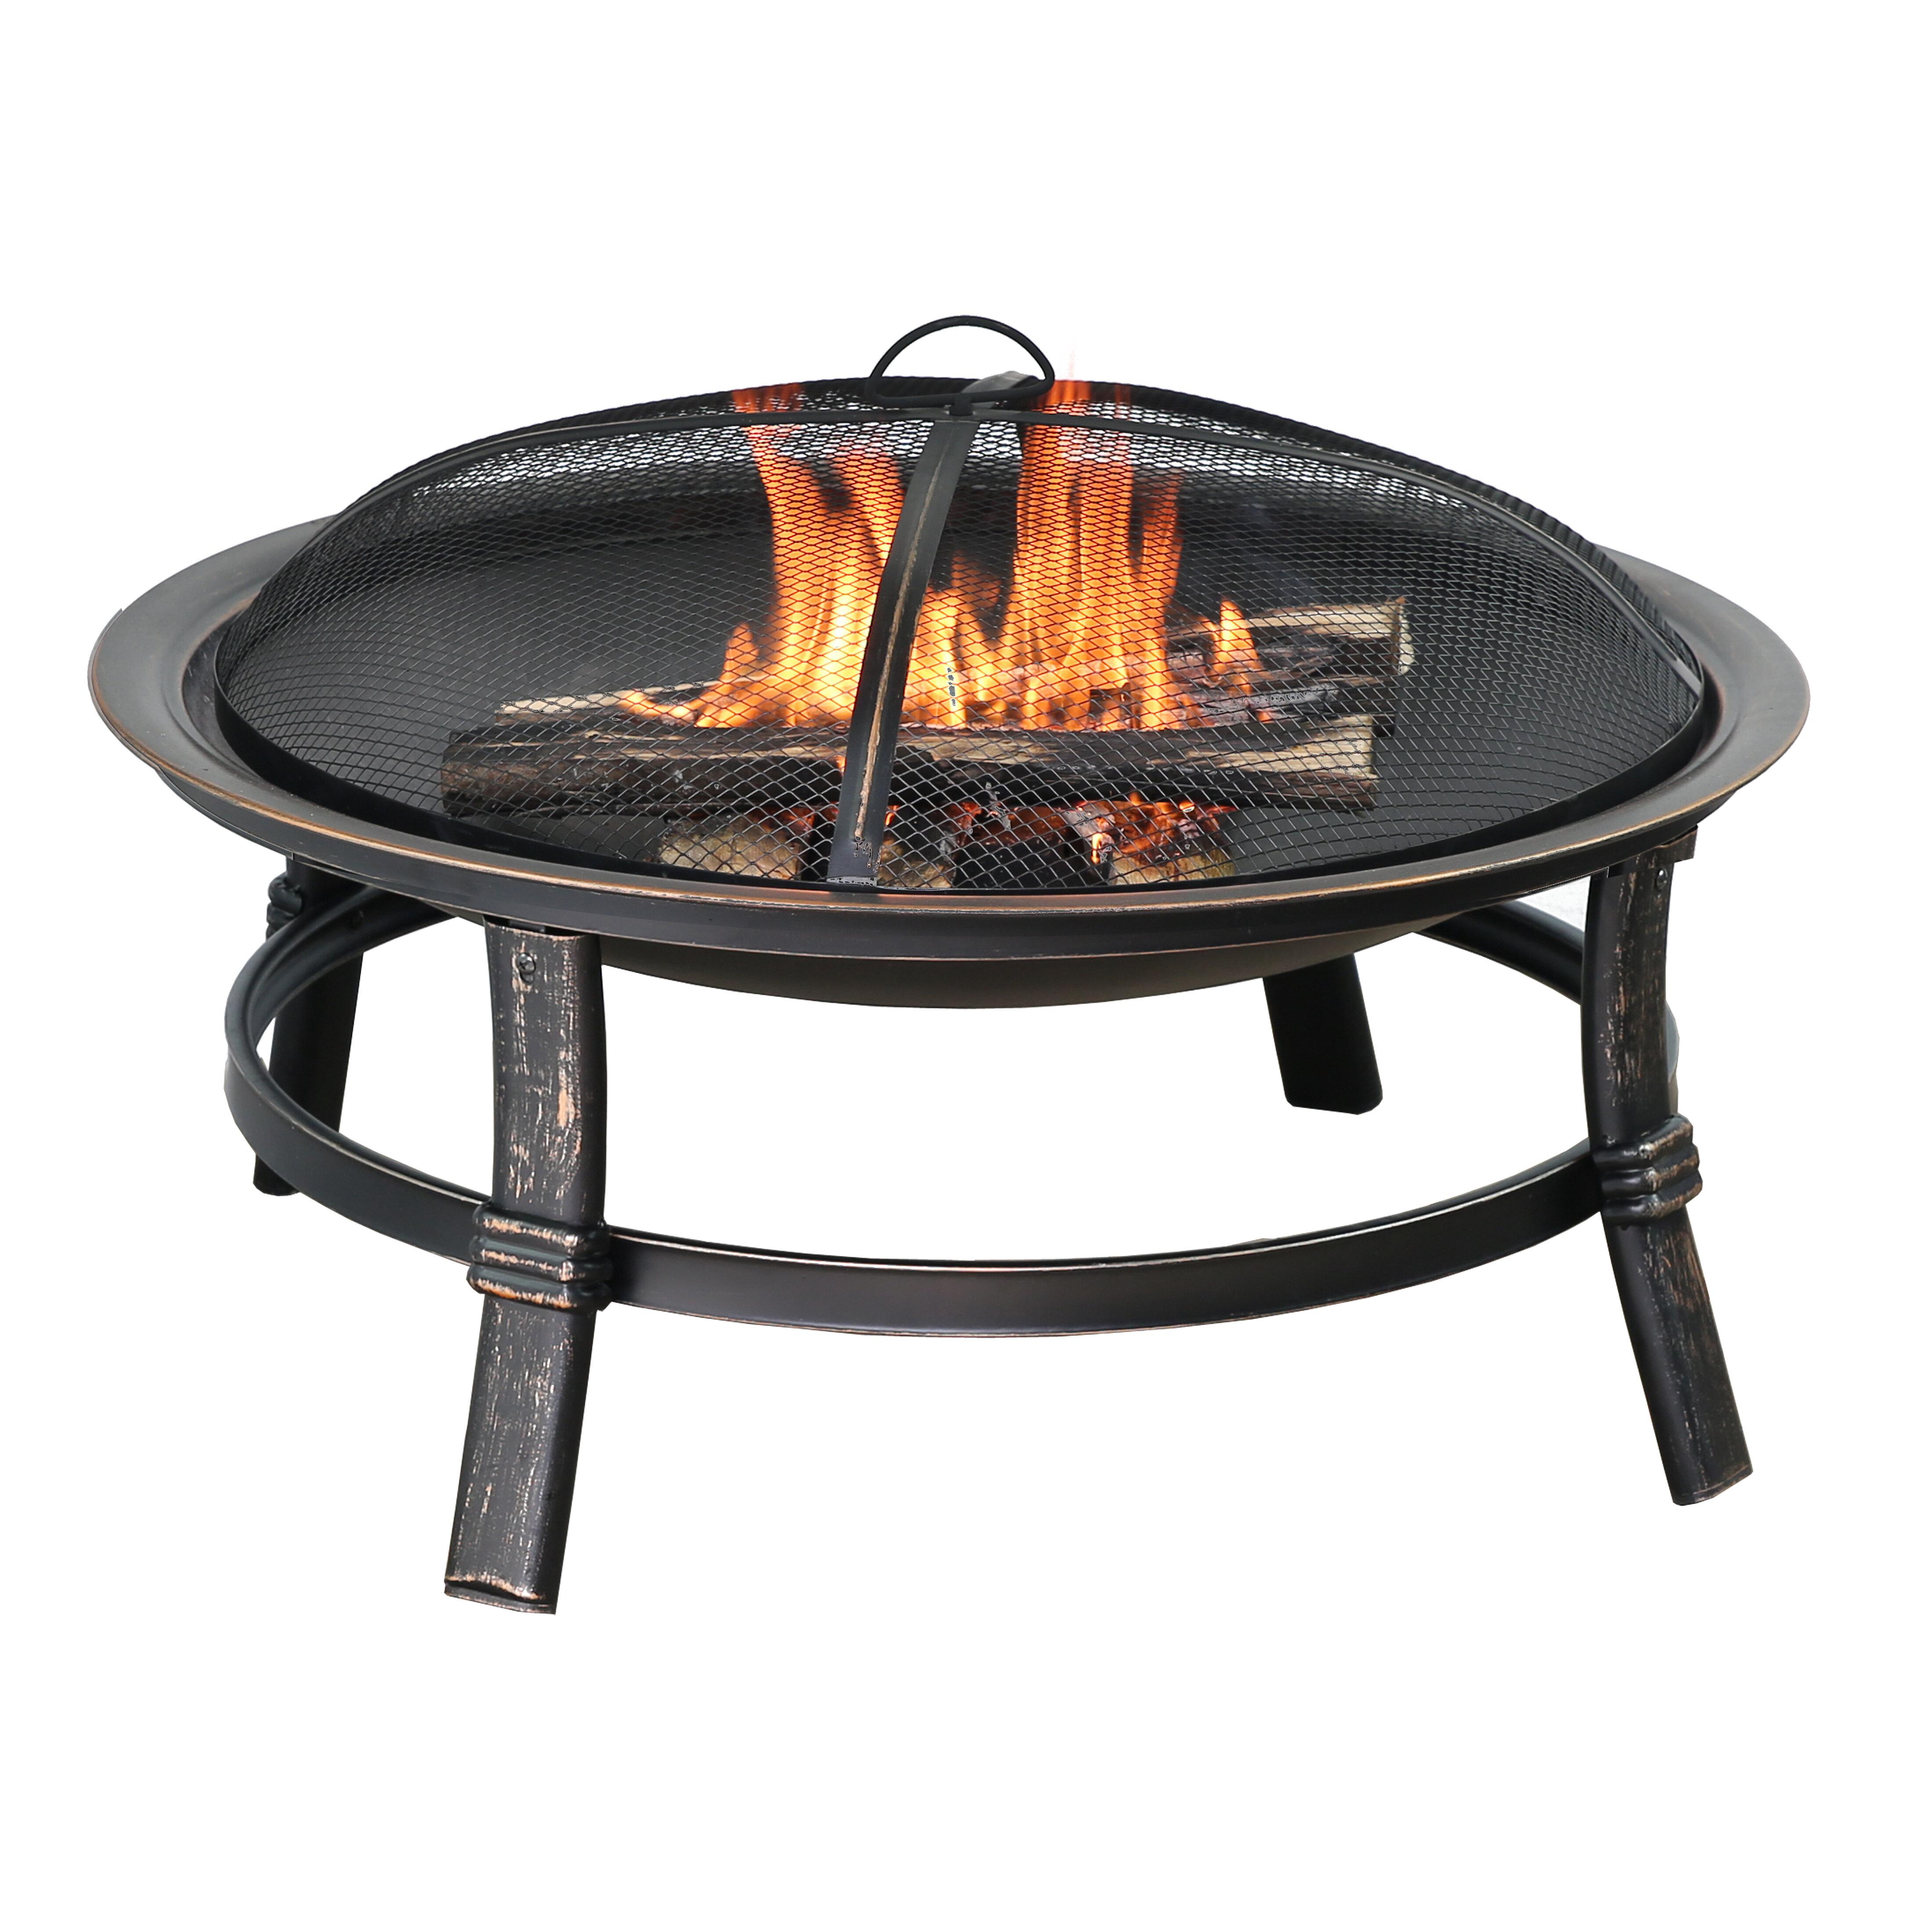 Endless Summer Steel Wood Burning Fire Pit Reviews Wayfair